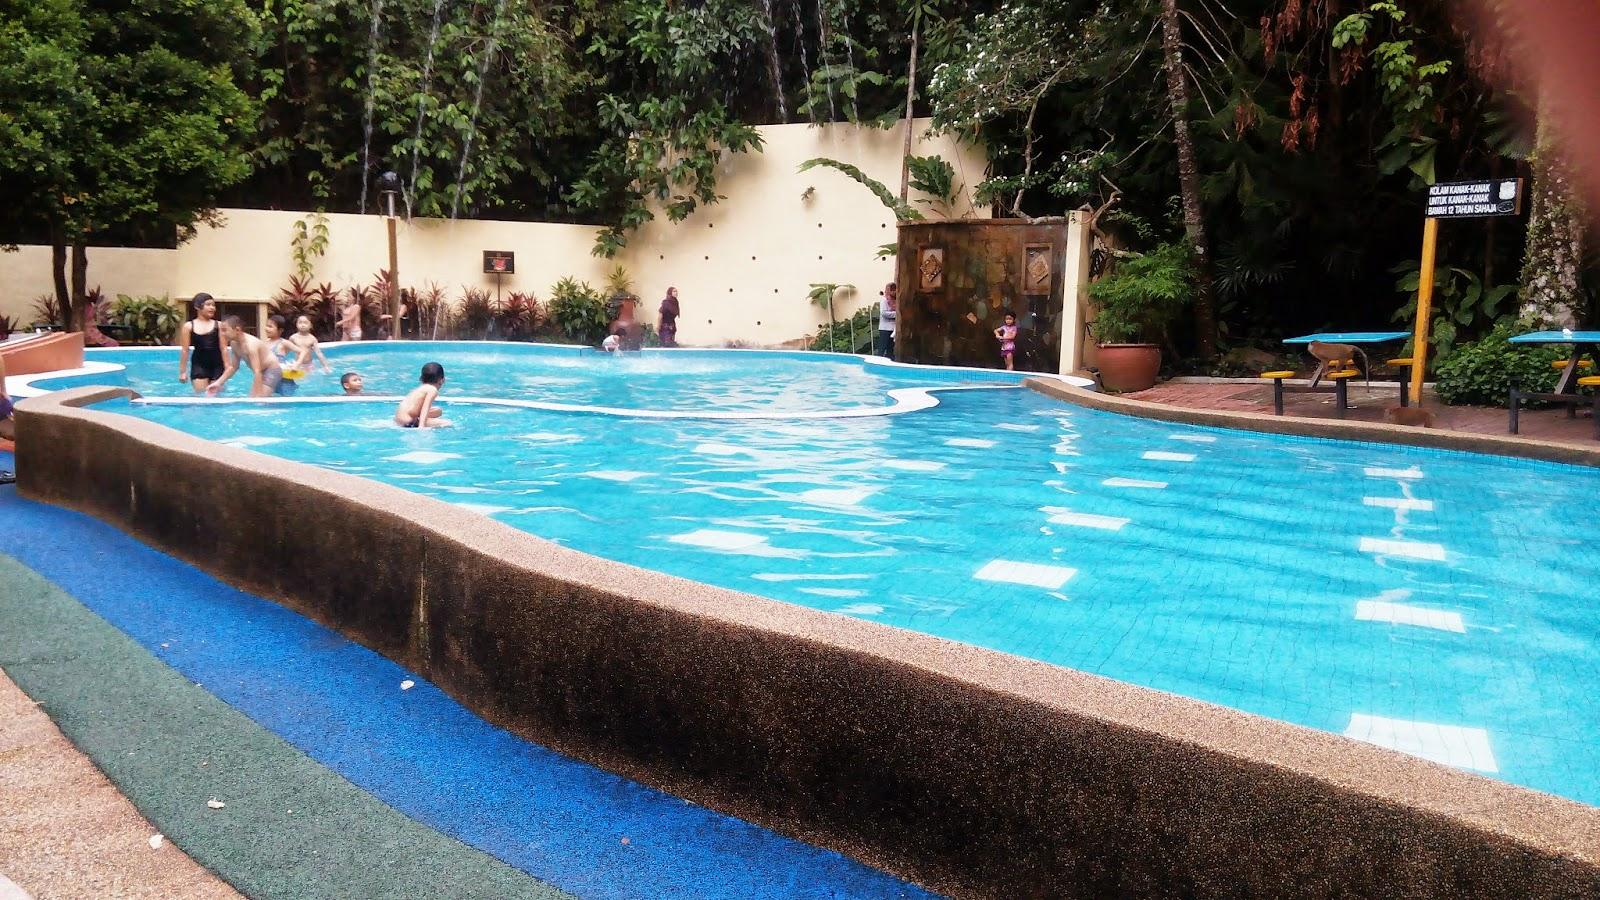 Kolam air, kanak-kanak, taman belia, pulau pinang, kids